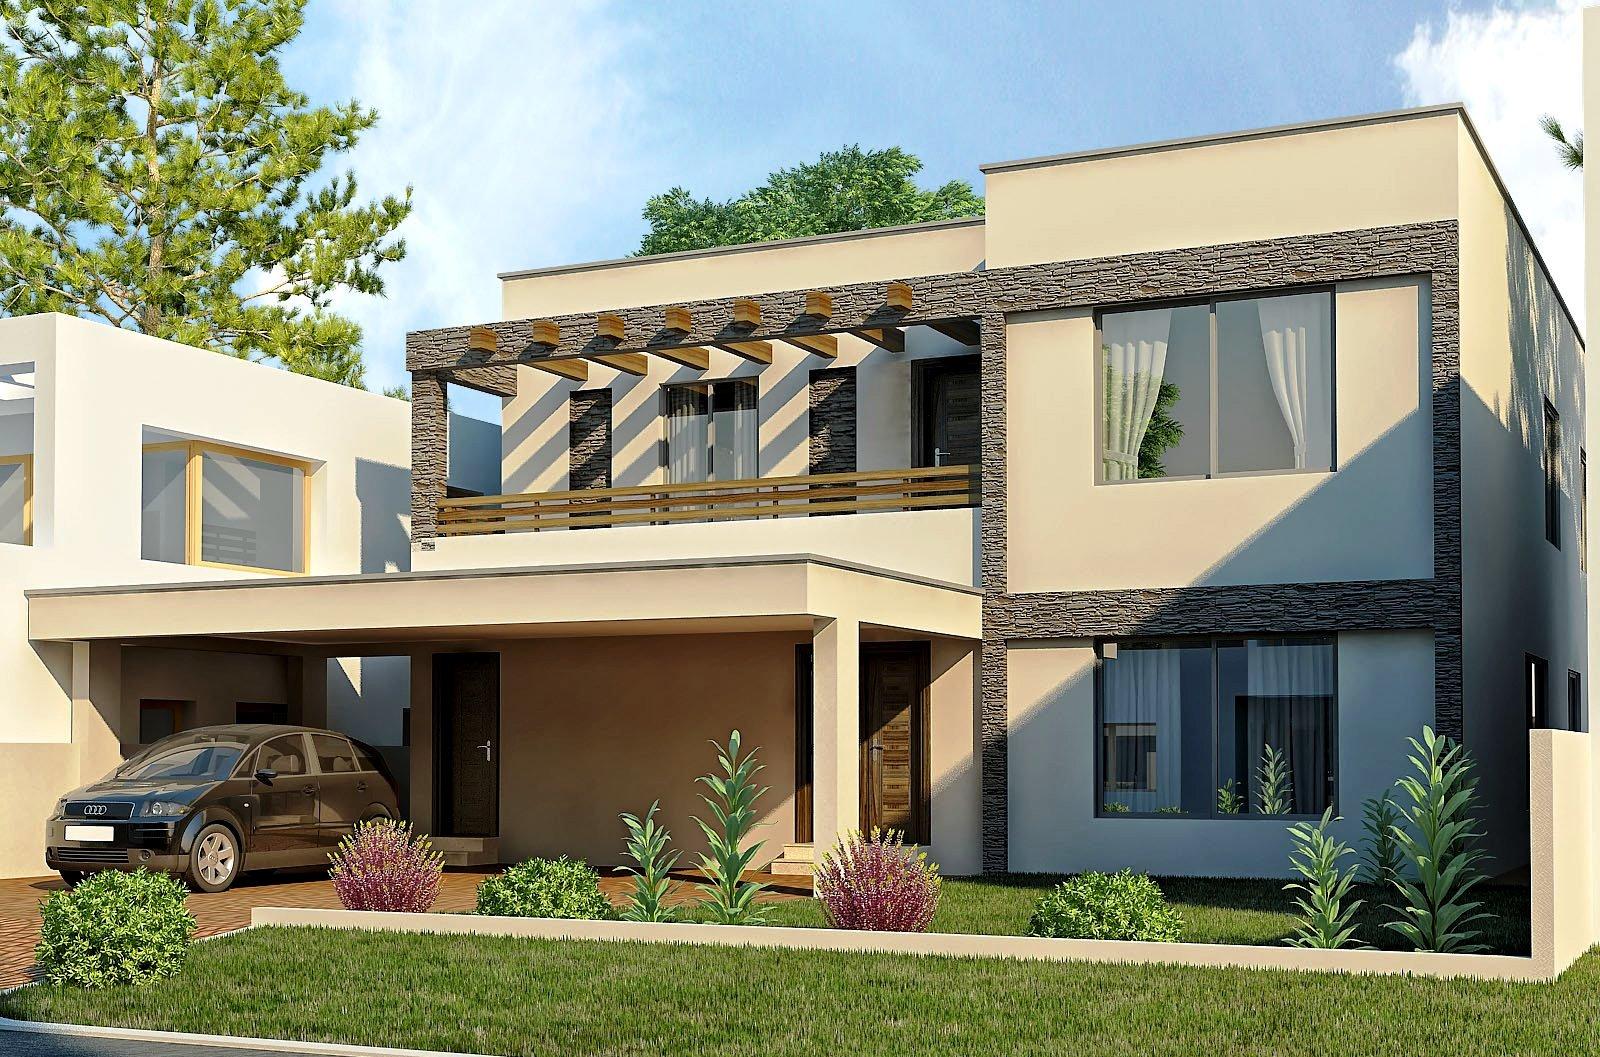 New home designs latest.: Modern homes exterior designs views.